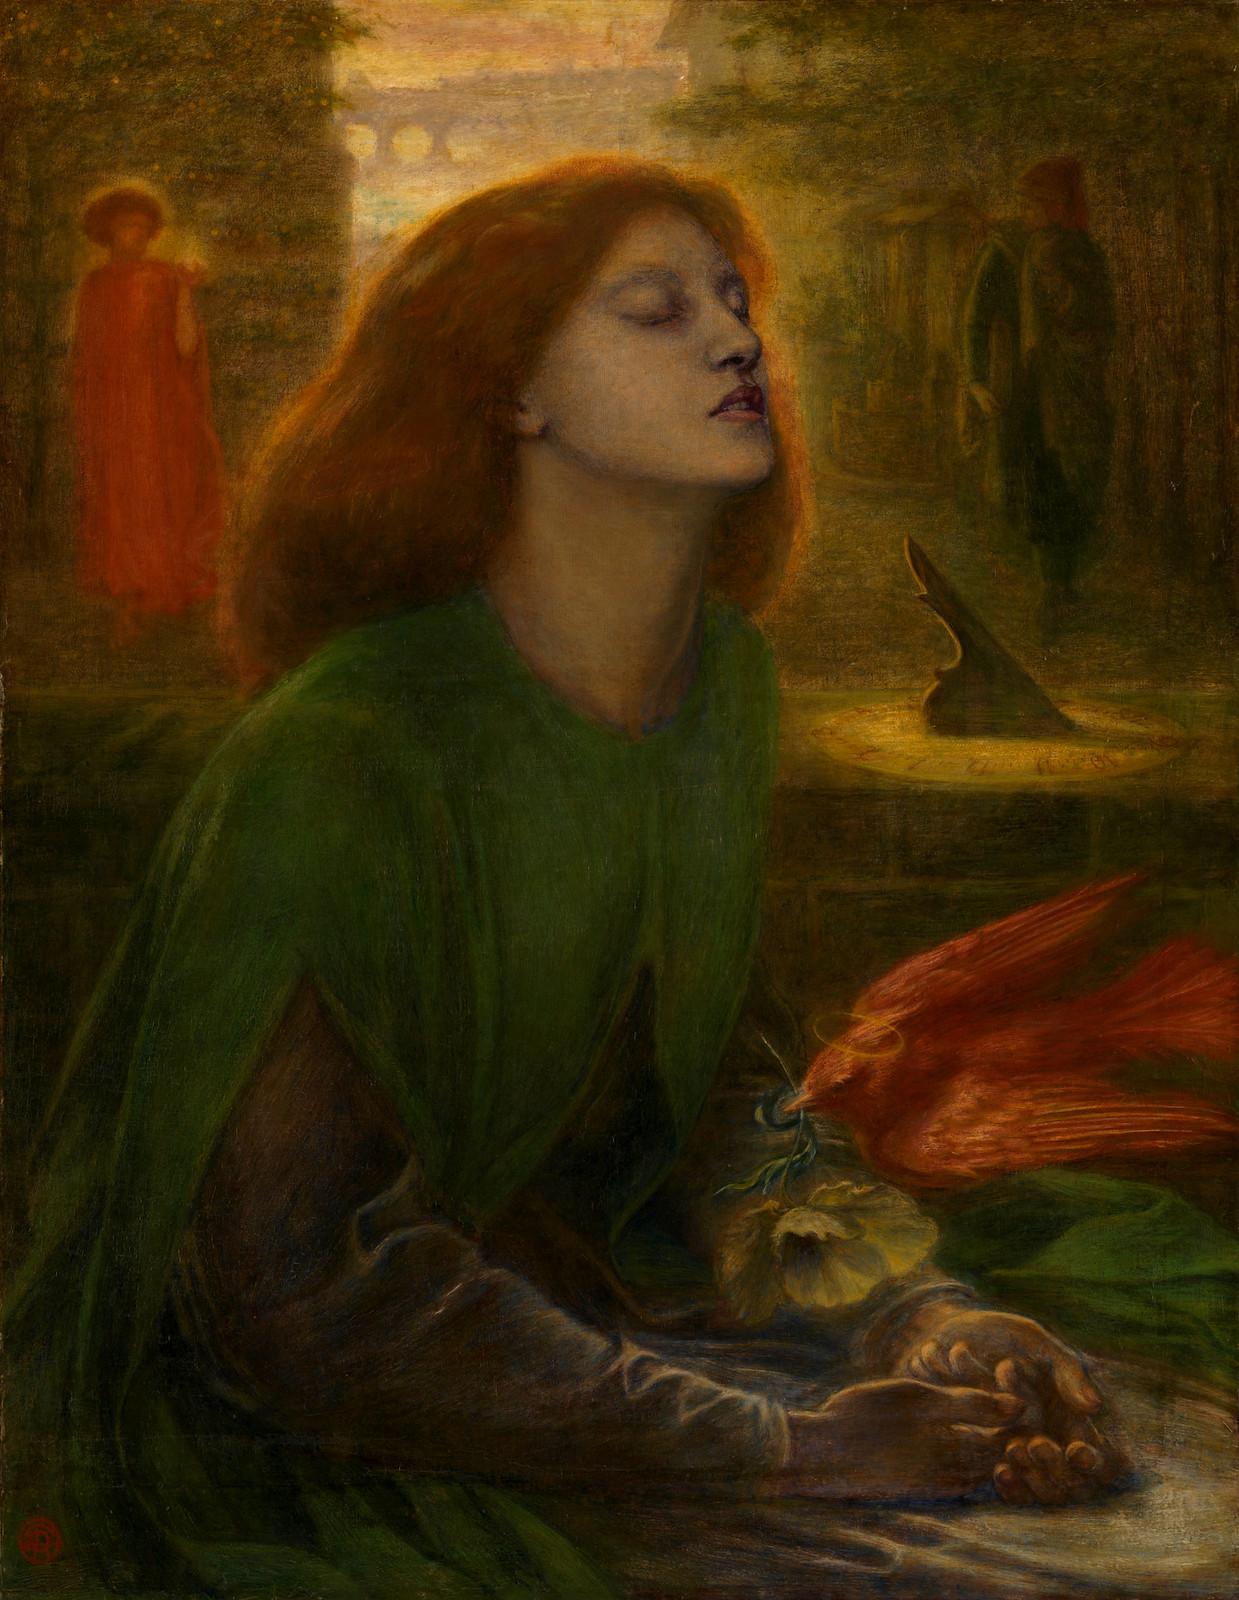 Beata Beatrix by Dante Gabriel Rossetti, 1864